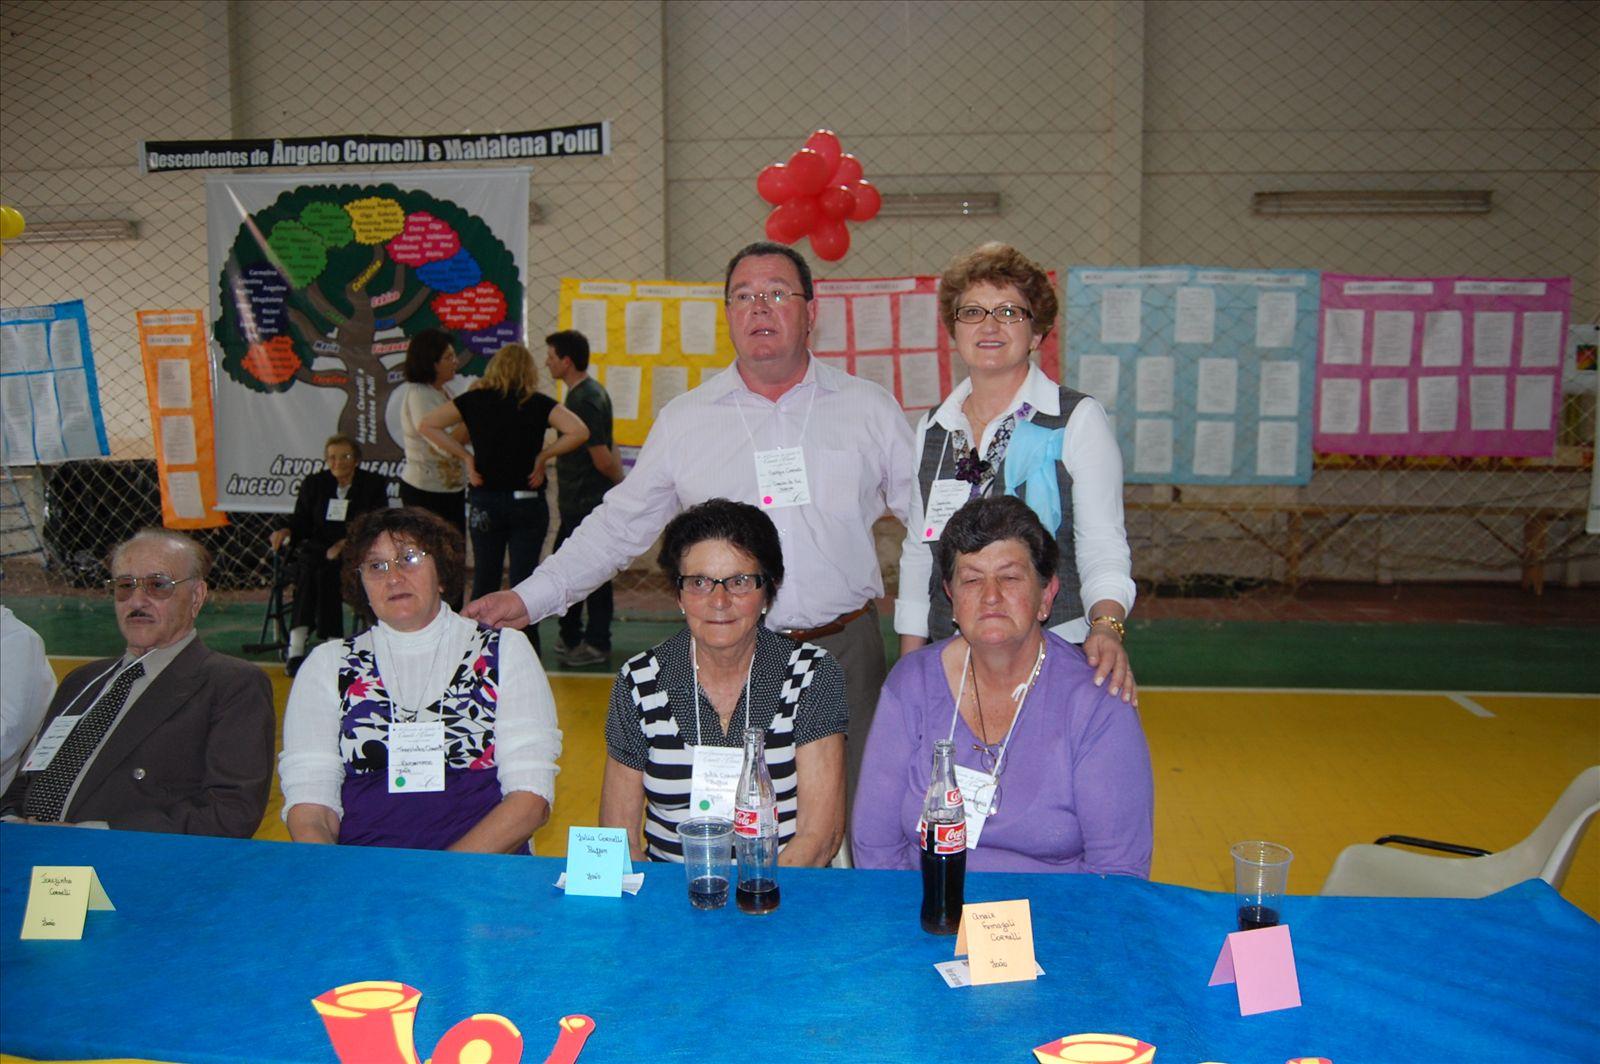 2º Encontro Família Cornelli - 11.10.2009 (216)_0